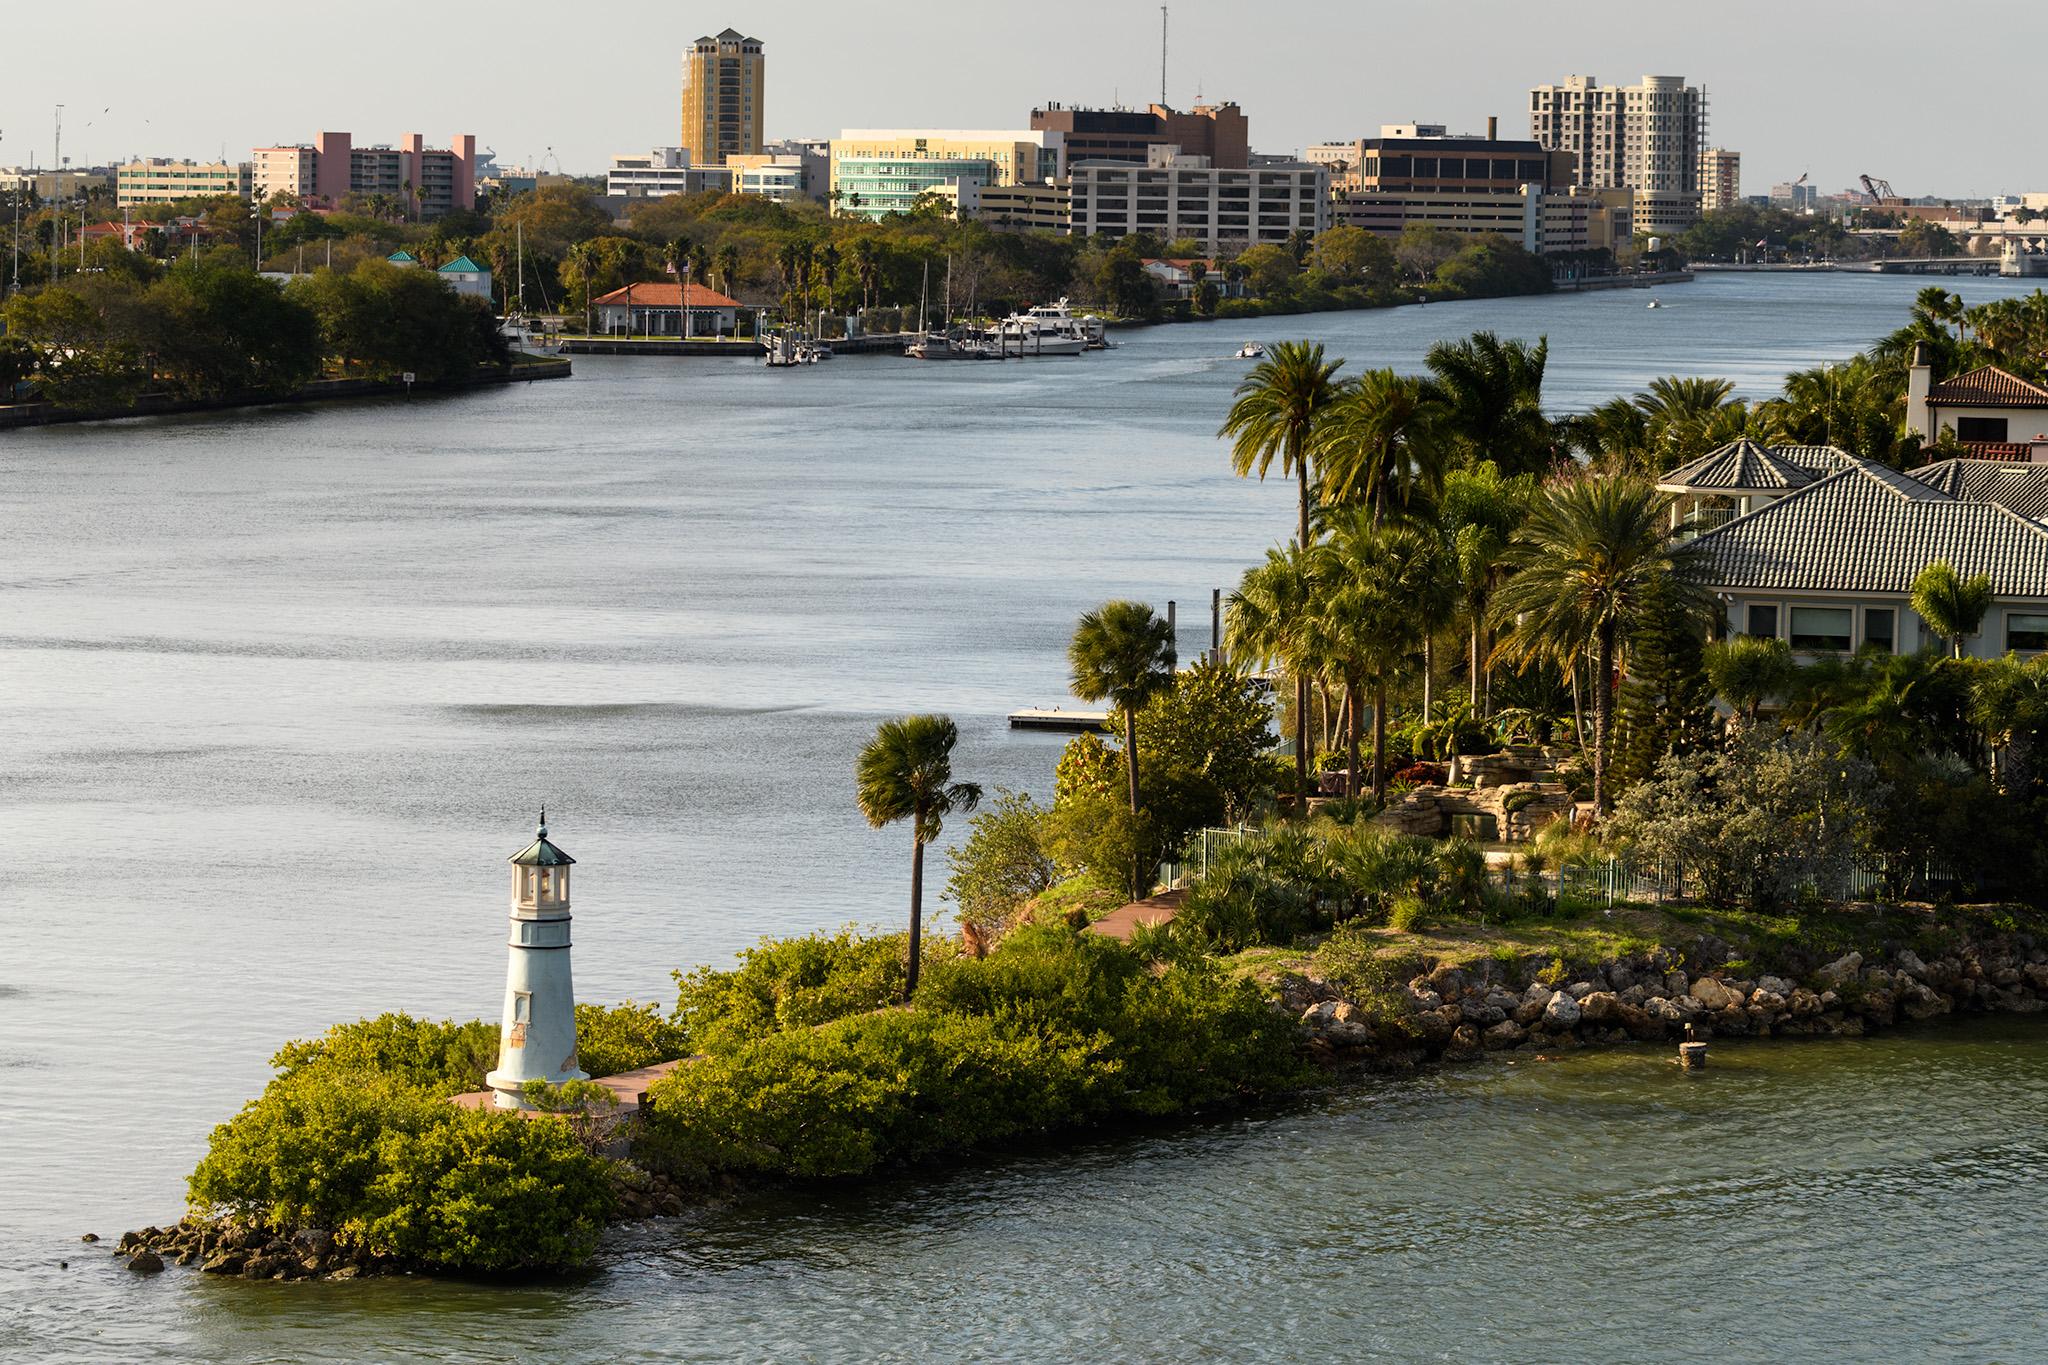 20170304 - Port of Tampa - 141.jpg